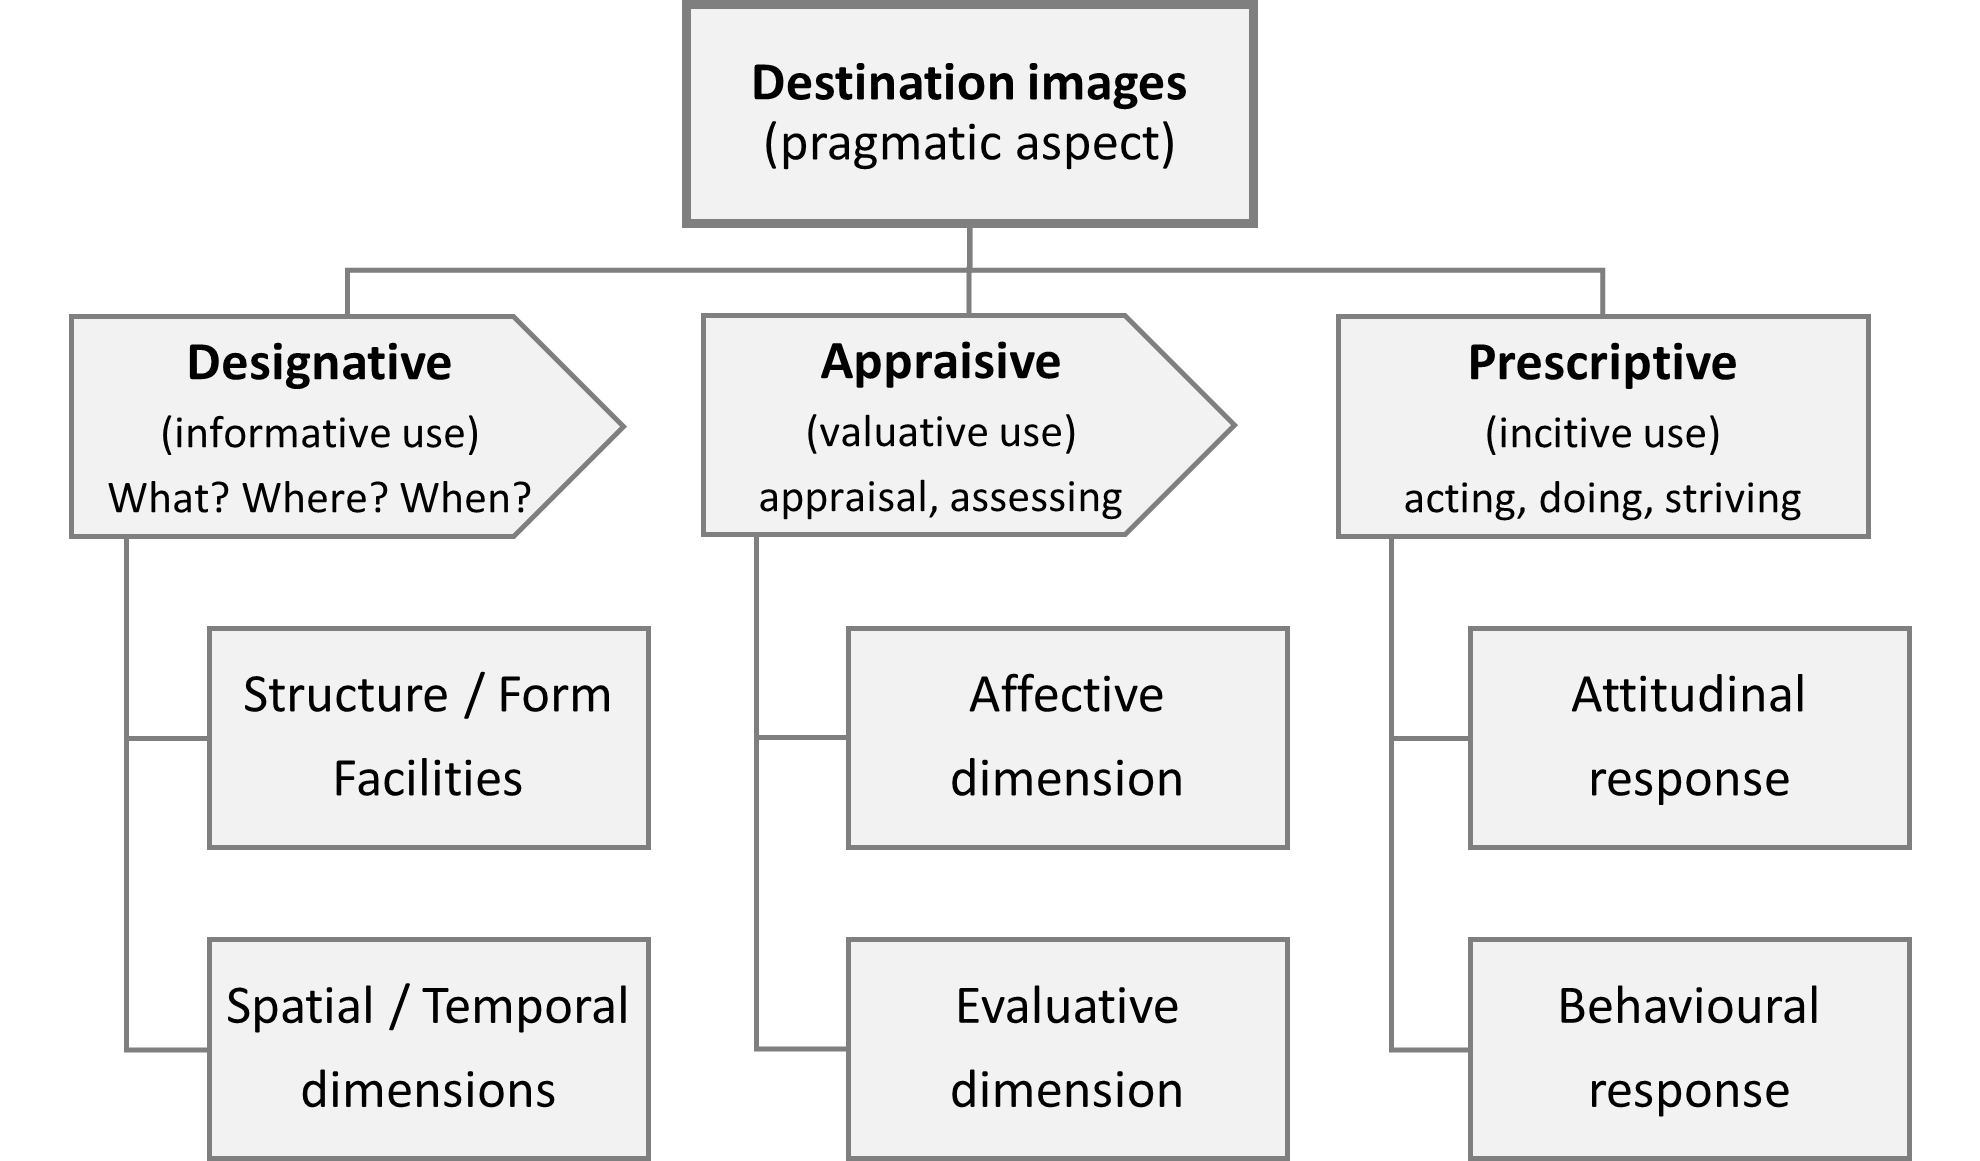 Figure showing semiotic aspects of destination images